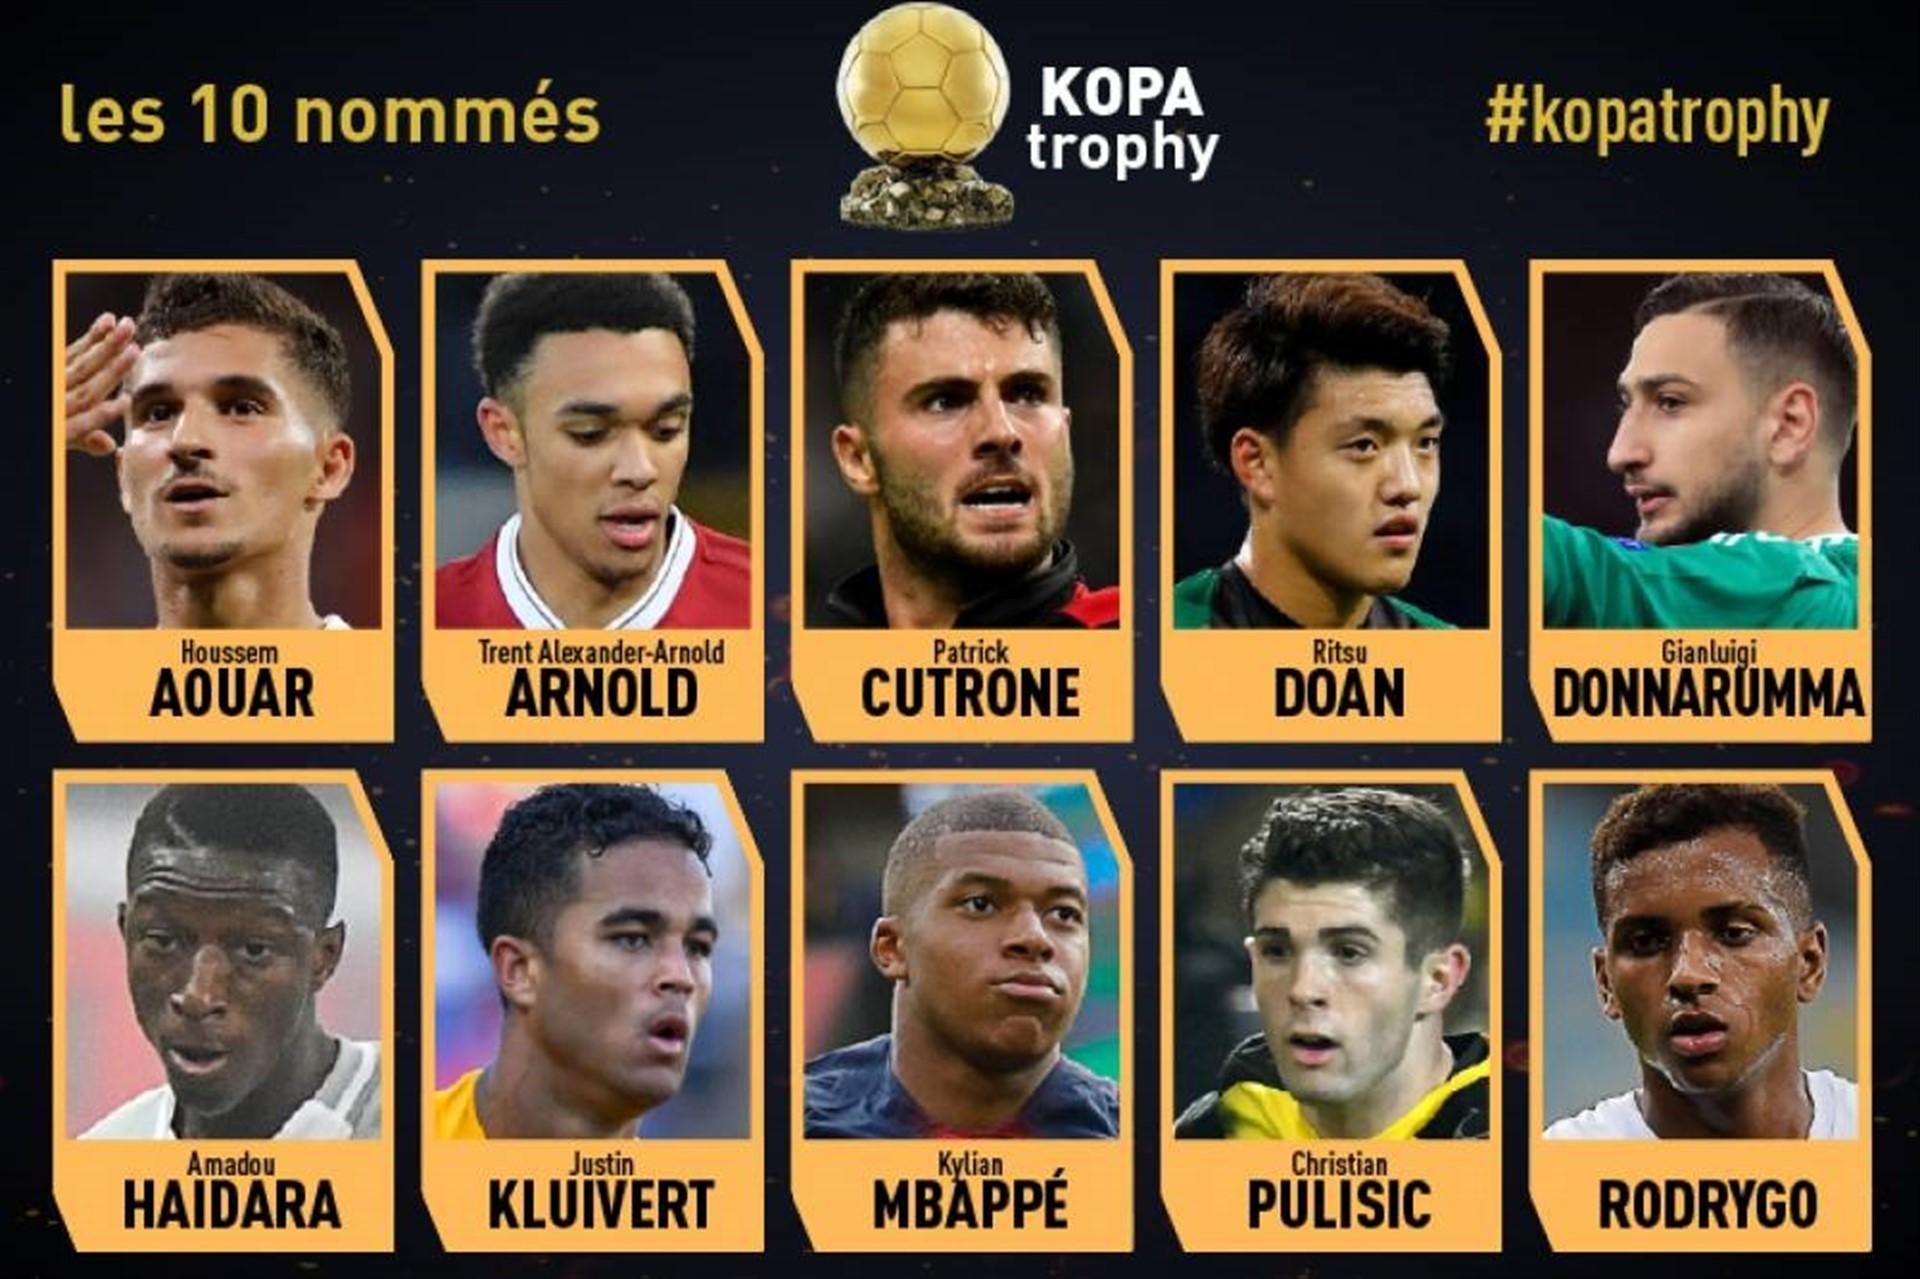 Mbappé encabeza la lista de candidatos al novedoso Trofeo Kopa